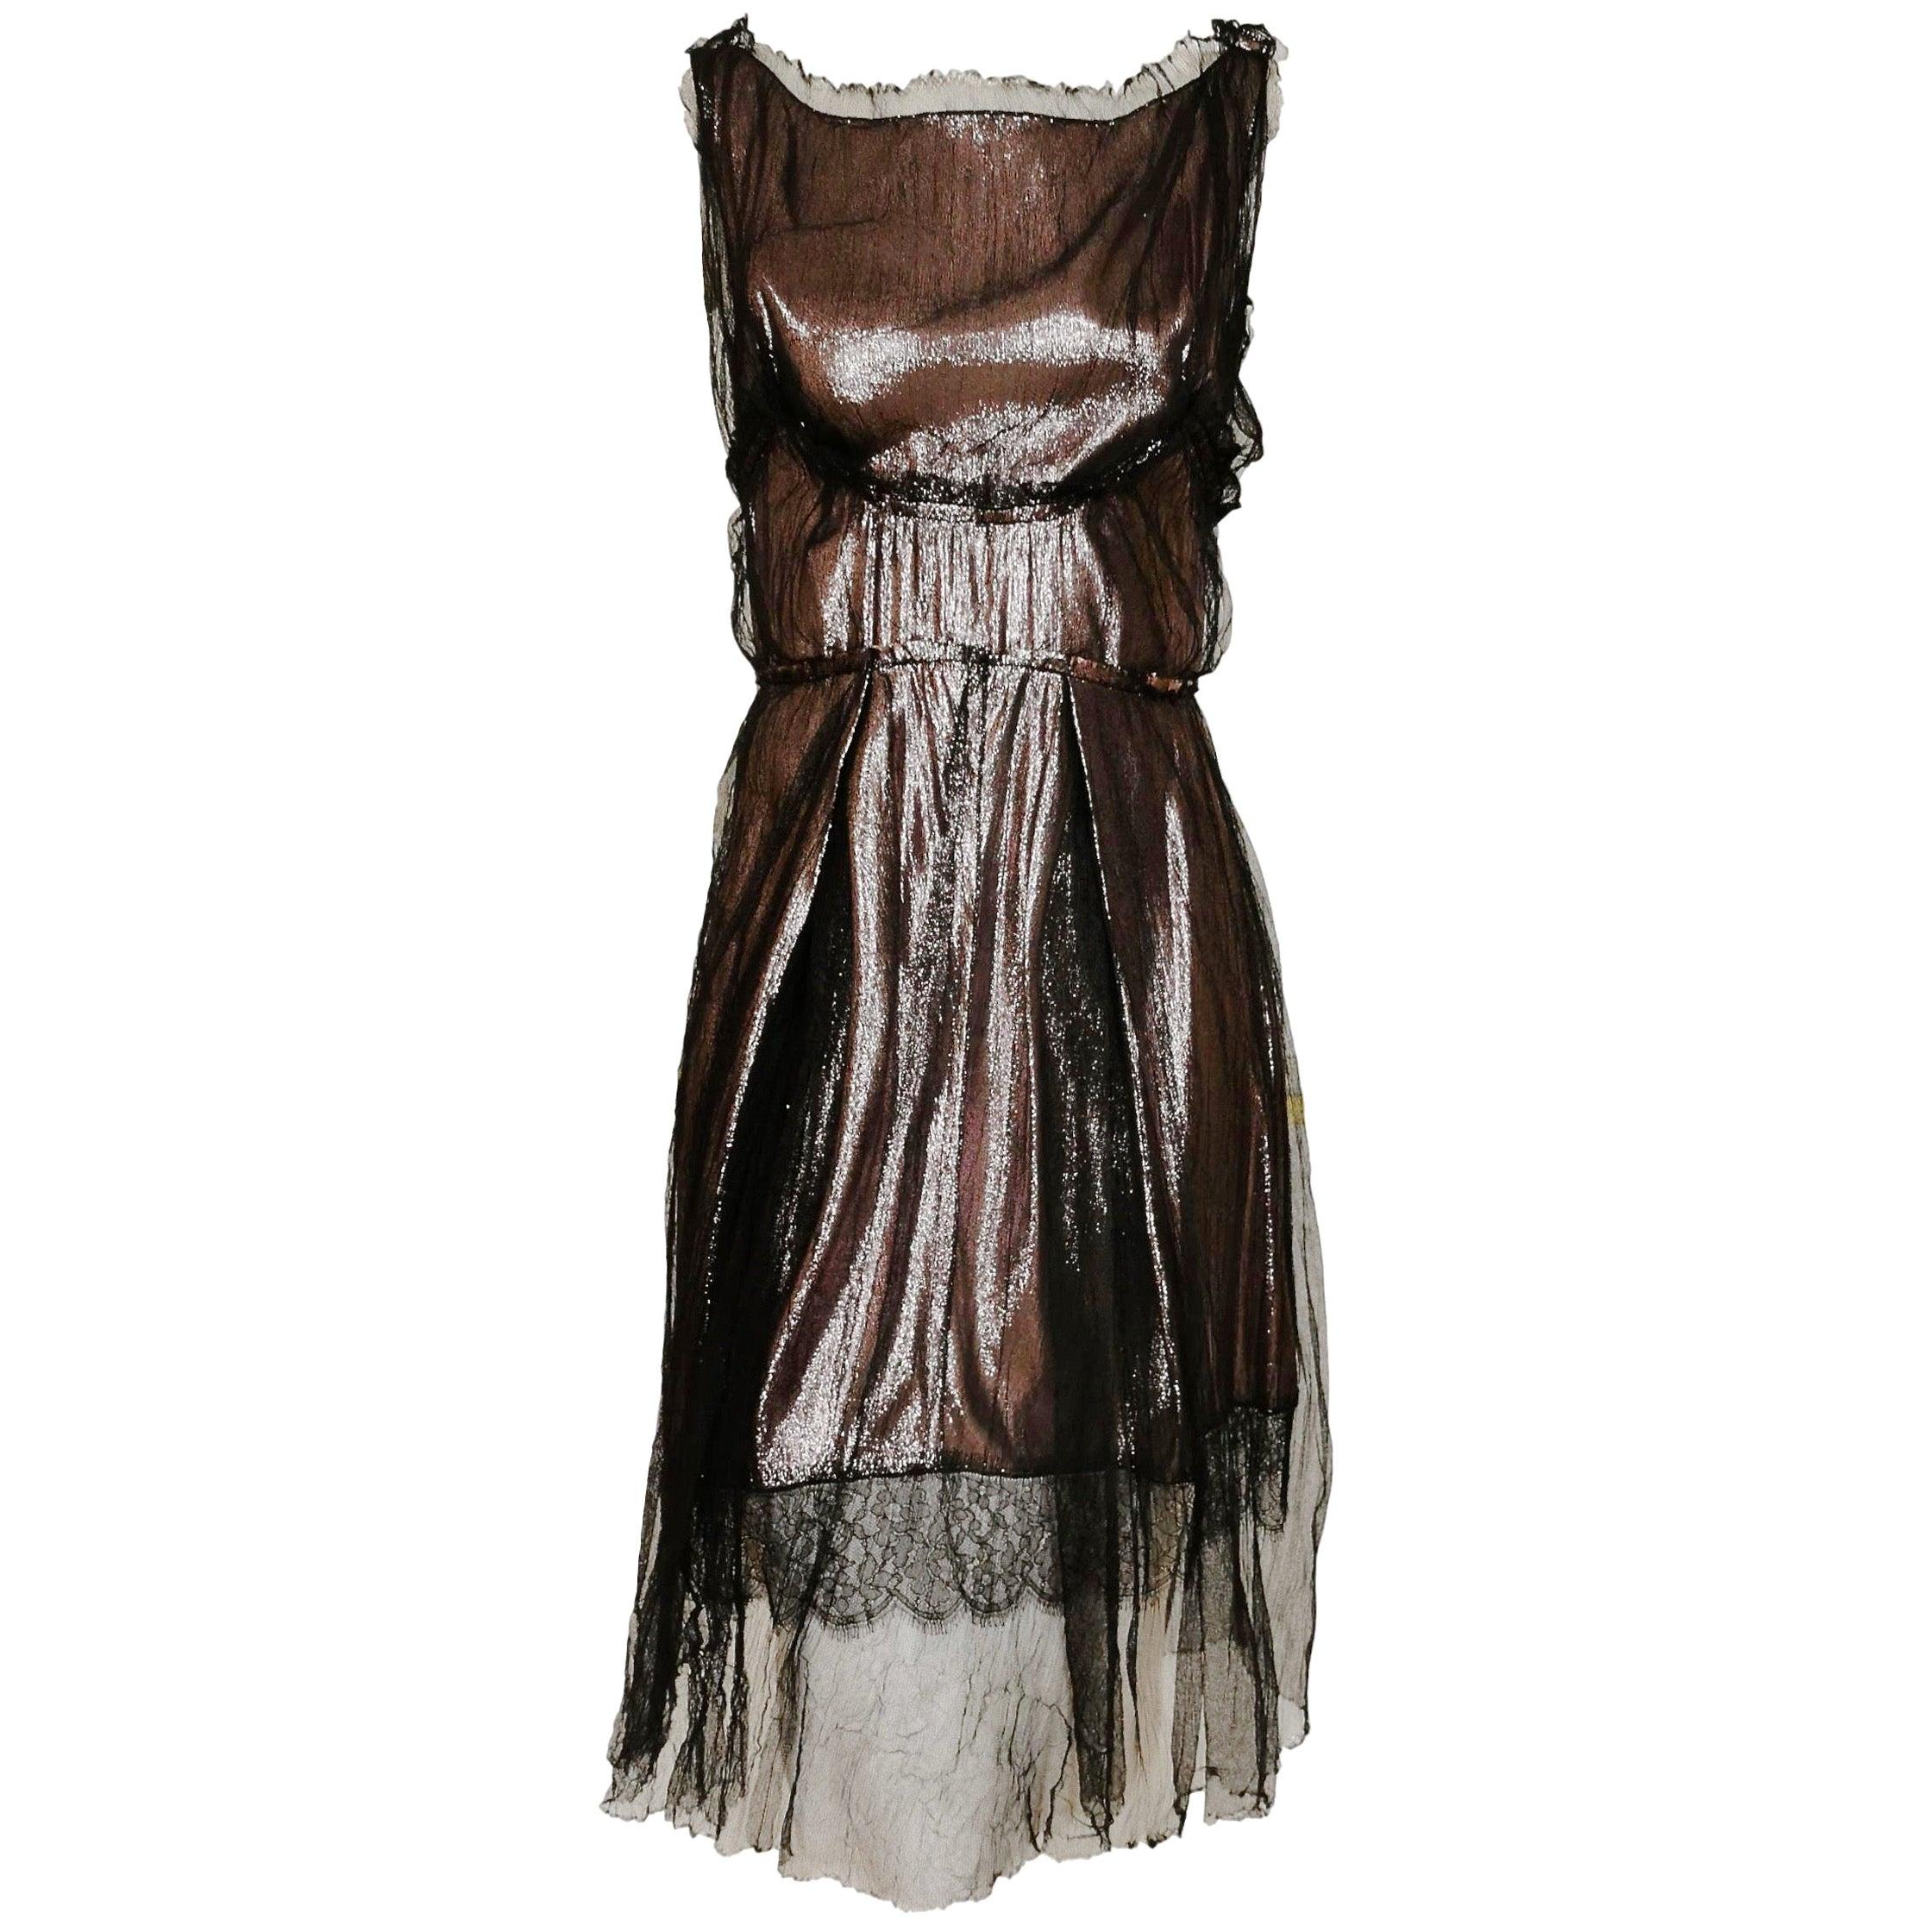 Nina Ricci Silk 1920's Style Flapper Dress